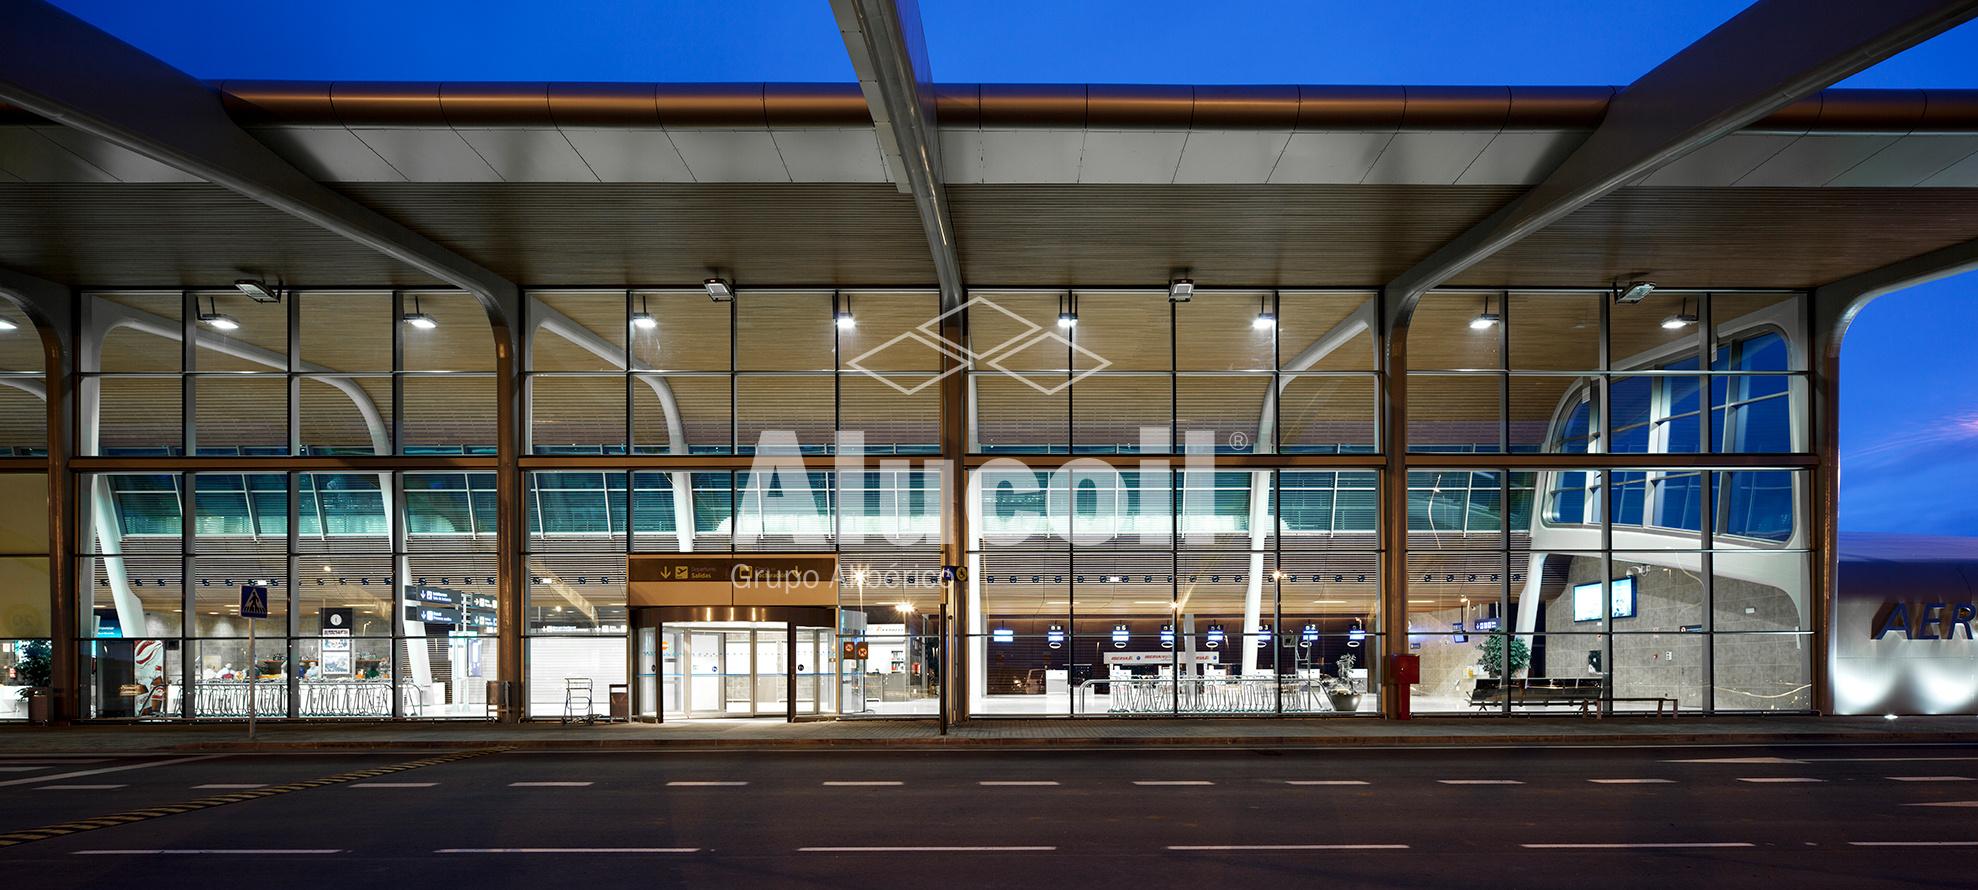 Leon Airport